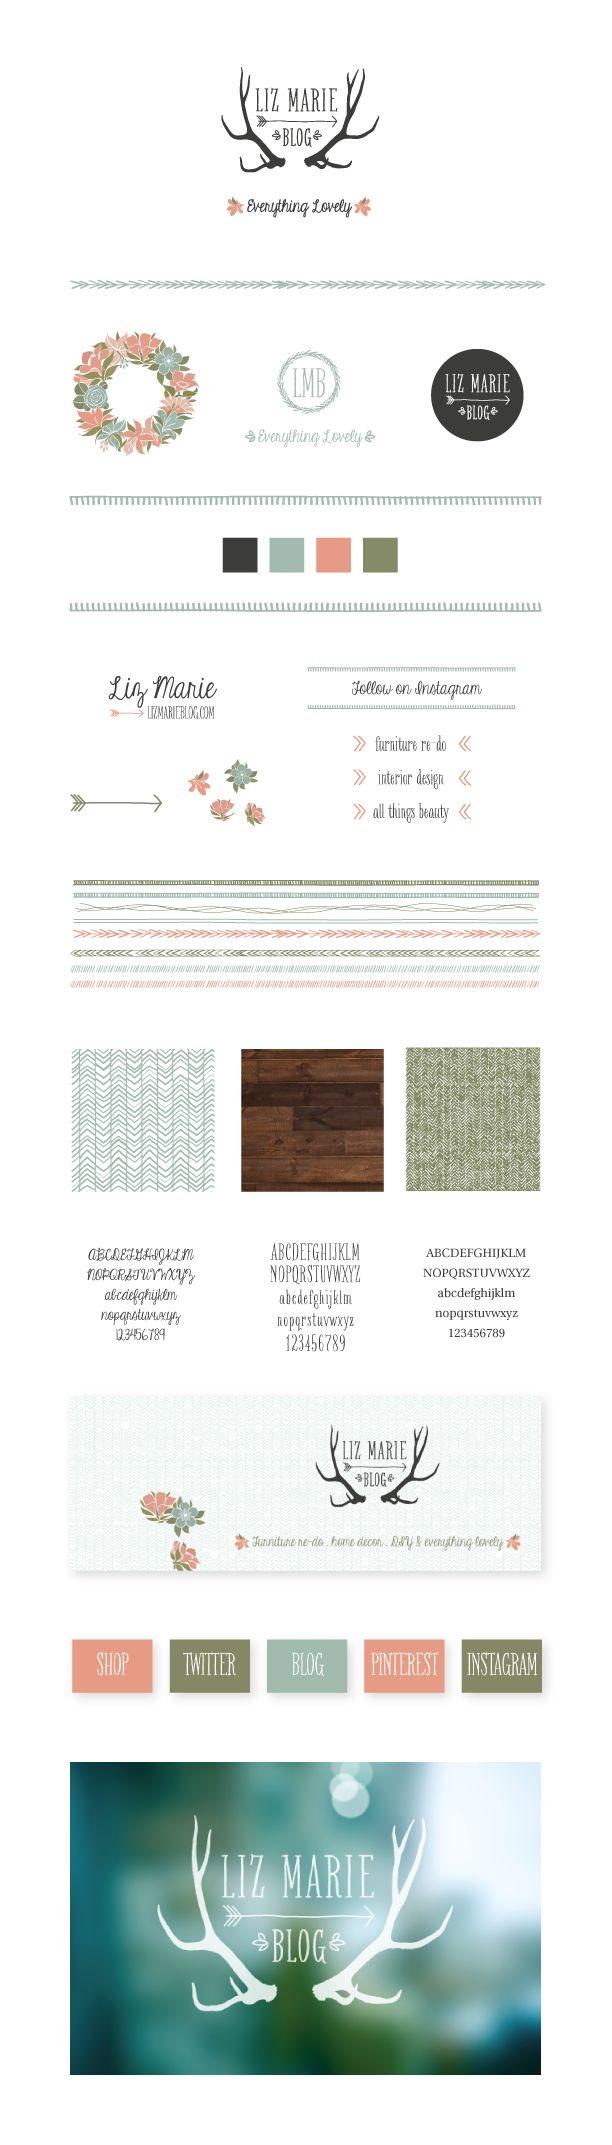 New Blog design on lizmarieblog.com